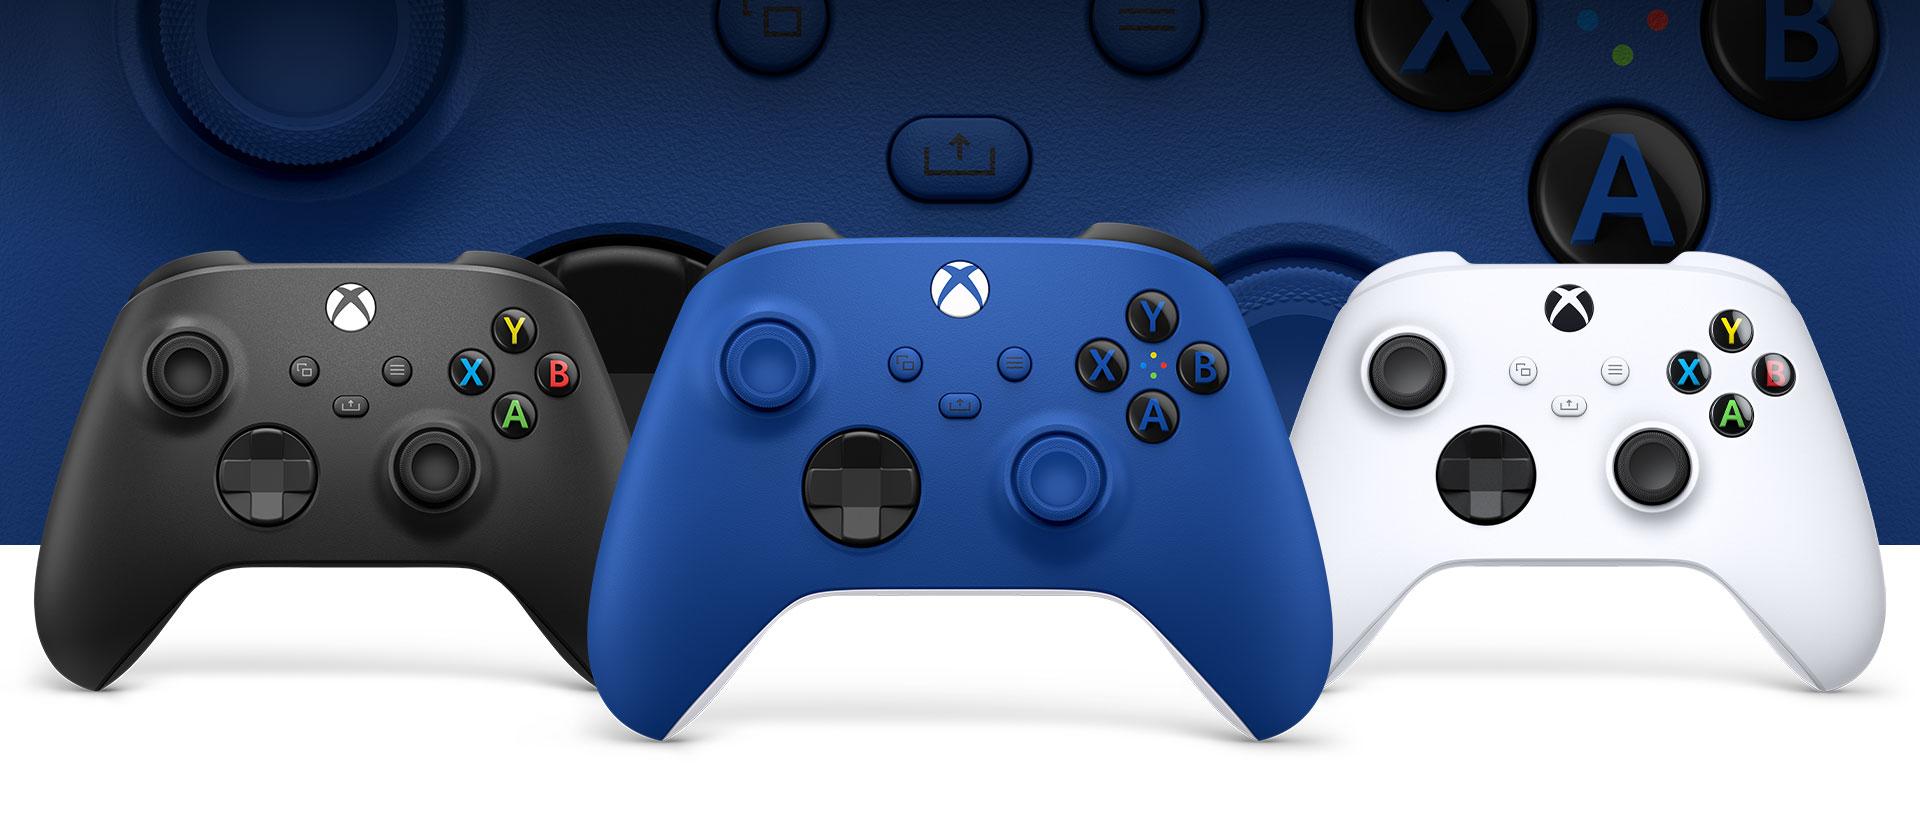 Giới thiệu Tay cầm chơi game Xbox Series X Controller - Shock Blue